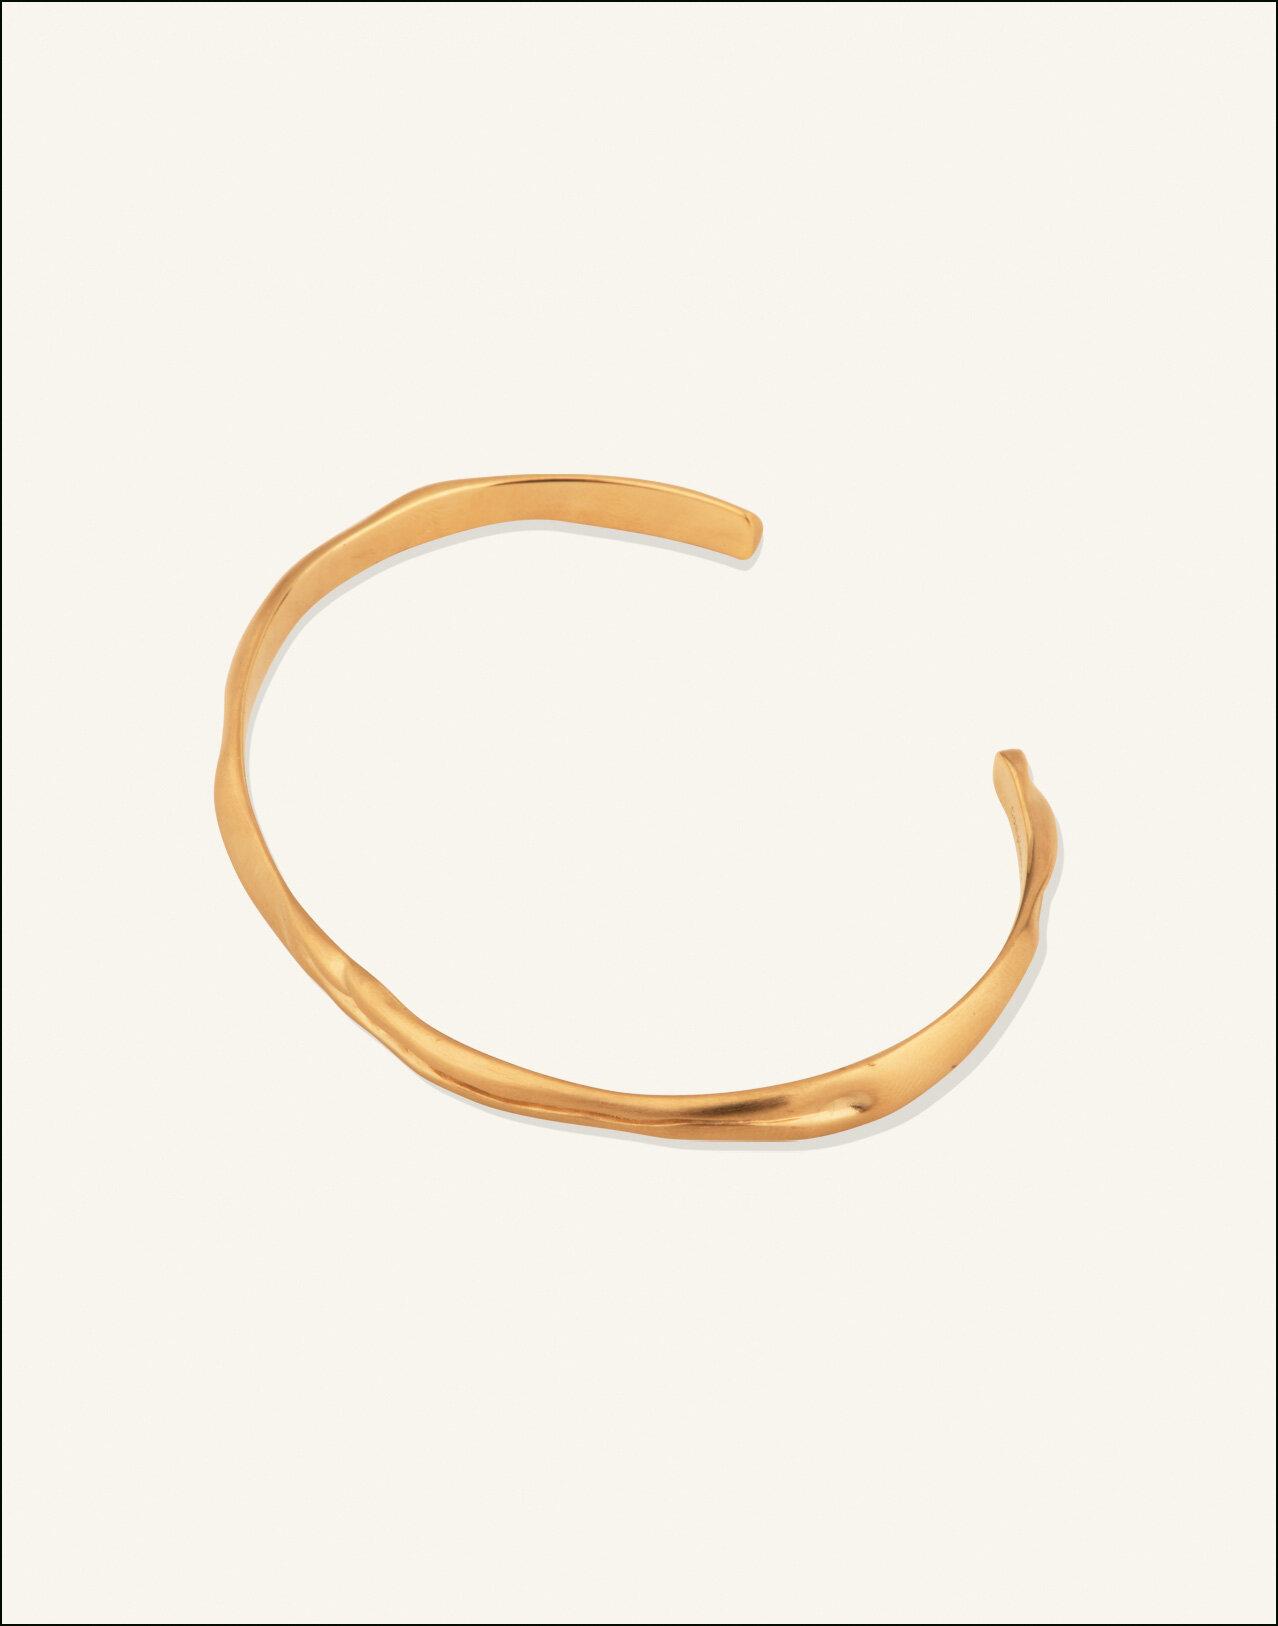 Completedworks-Gold-Vermeil-Cuff-Unconscious-Landscapes-2.jpg